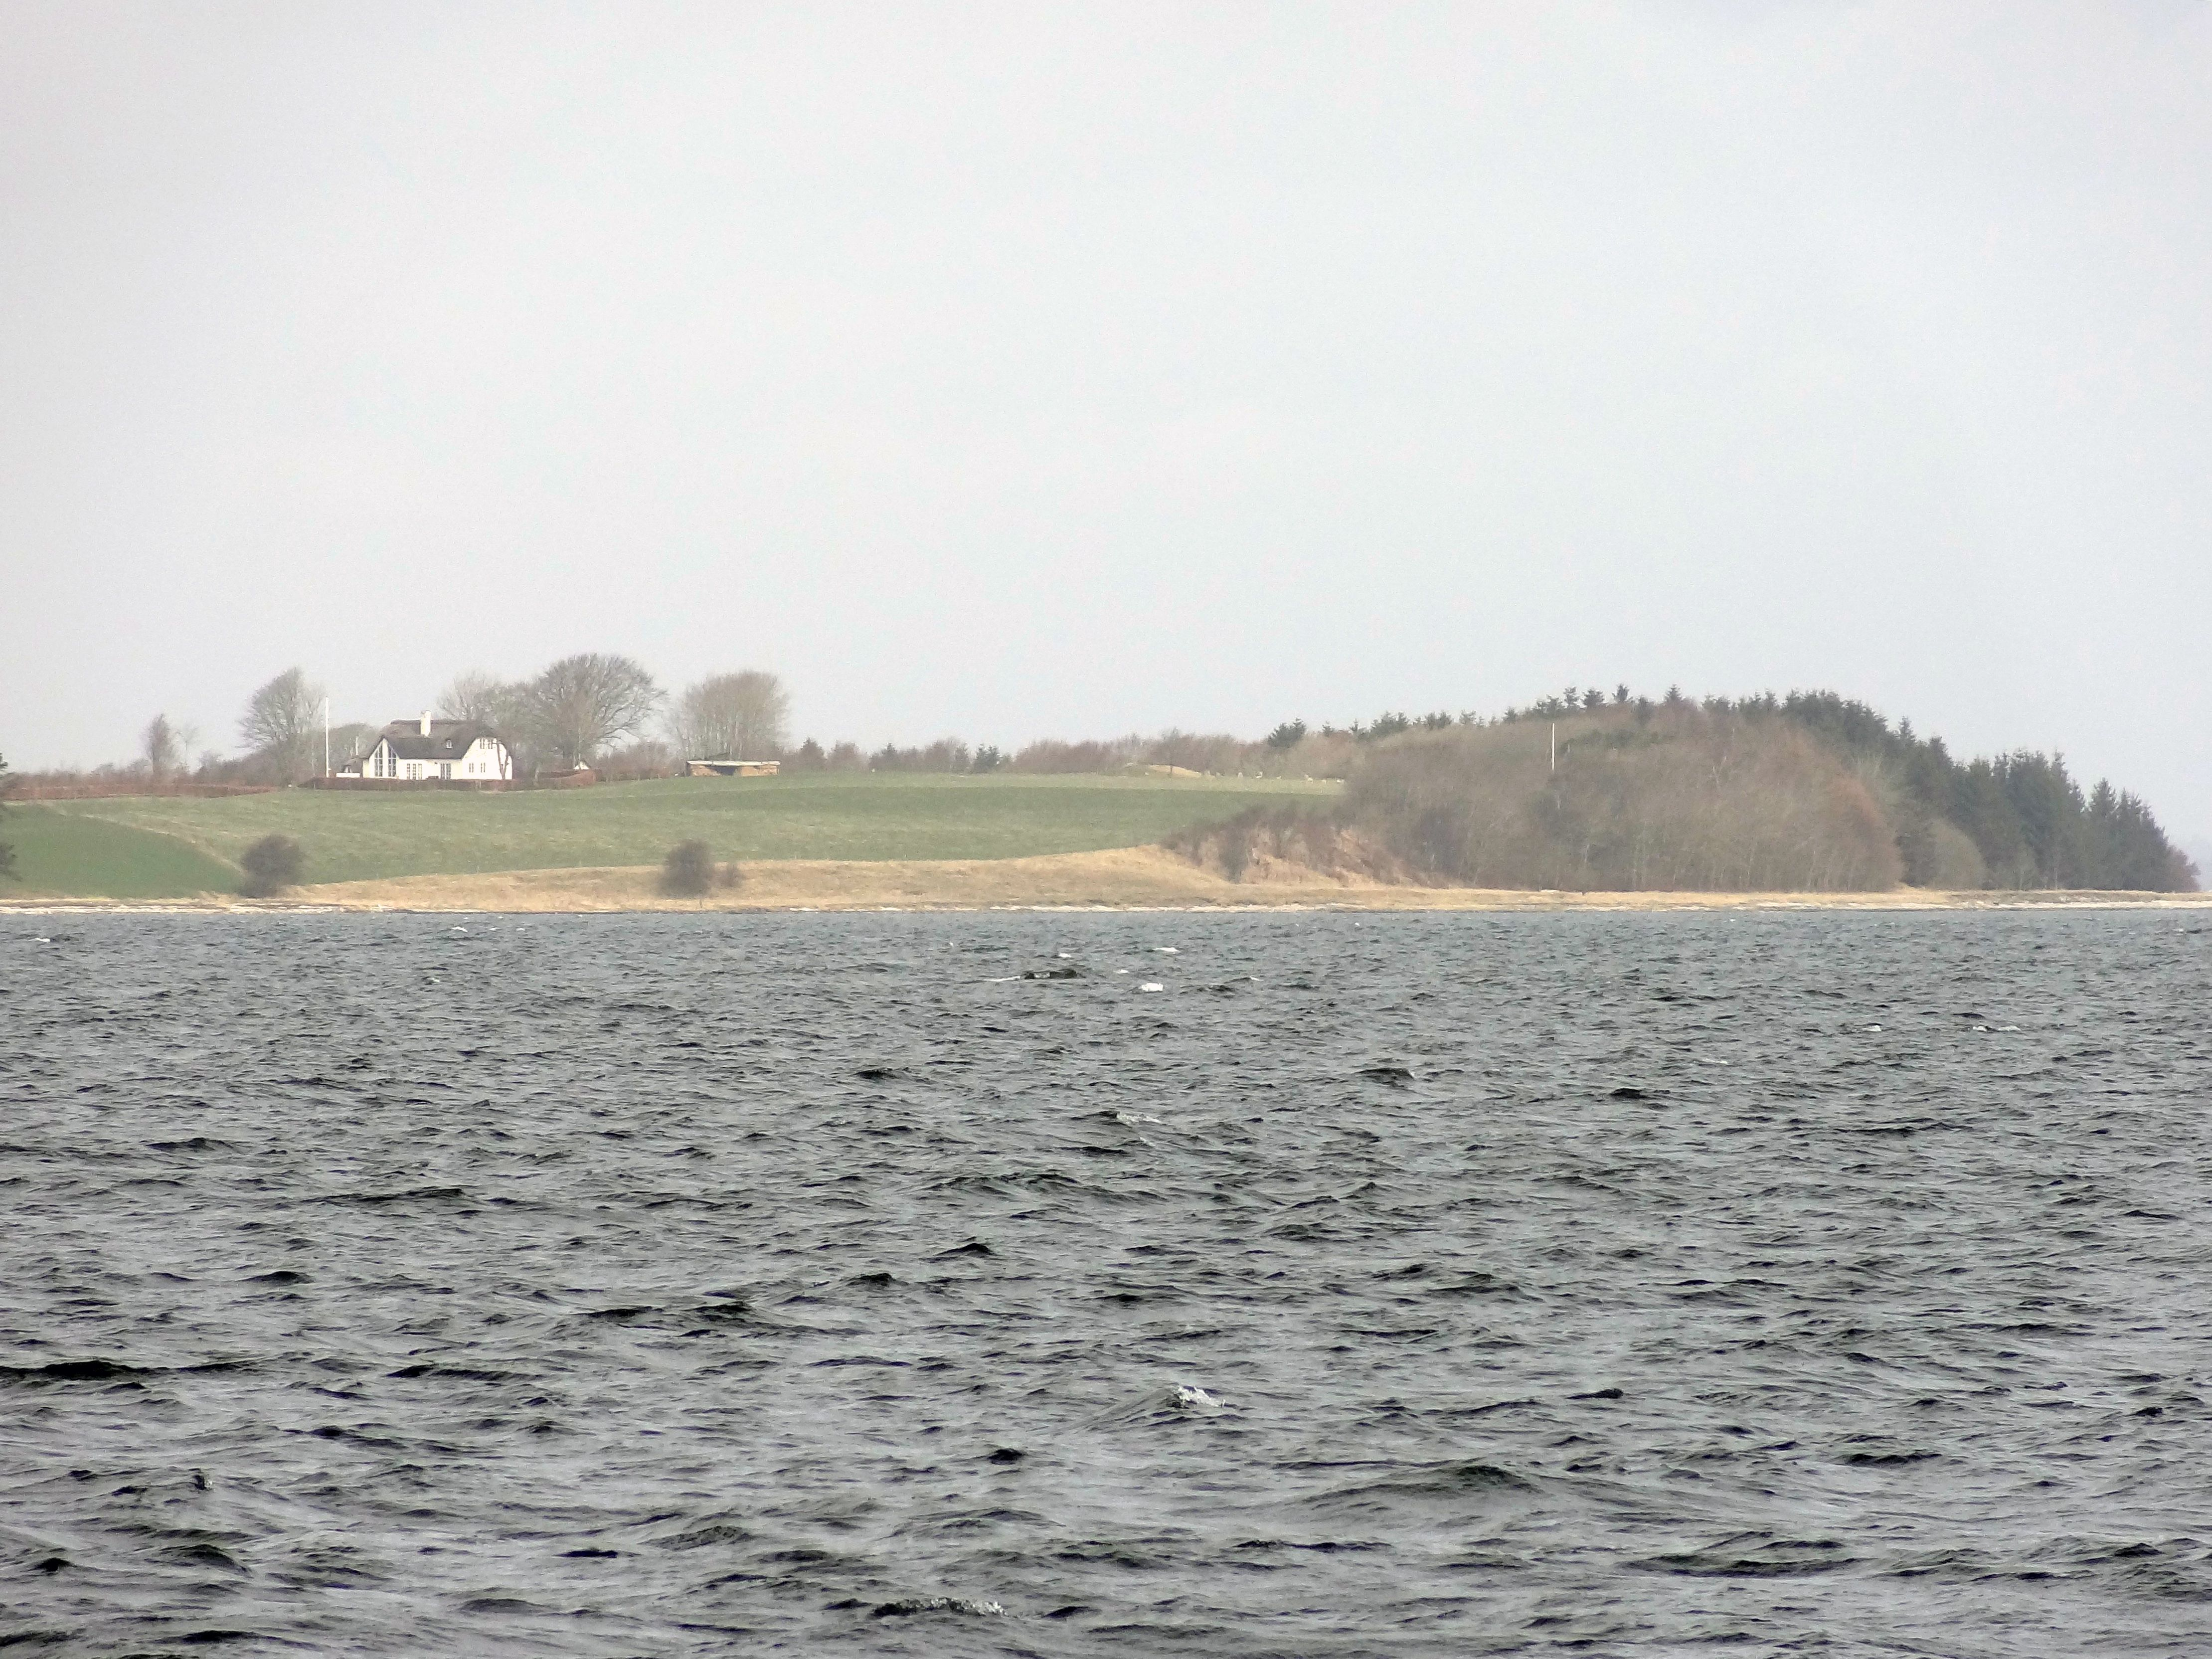 Ufer im Limfjord